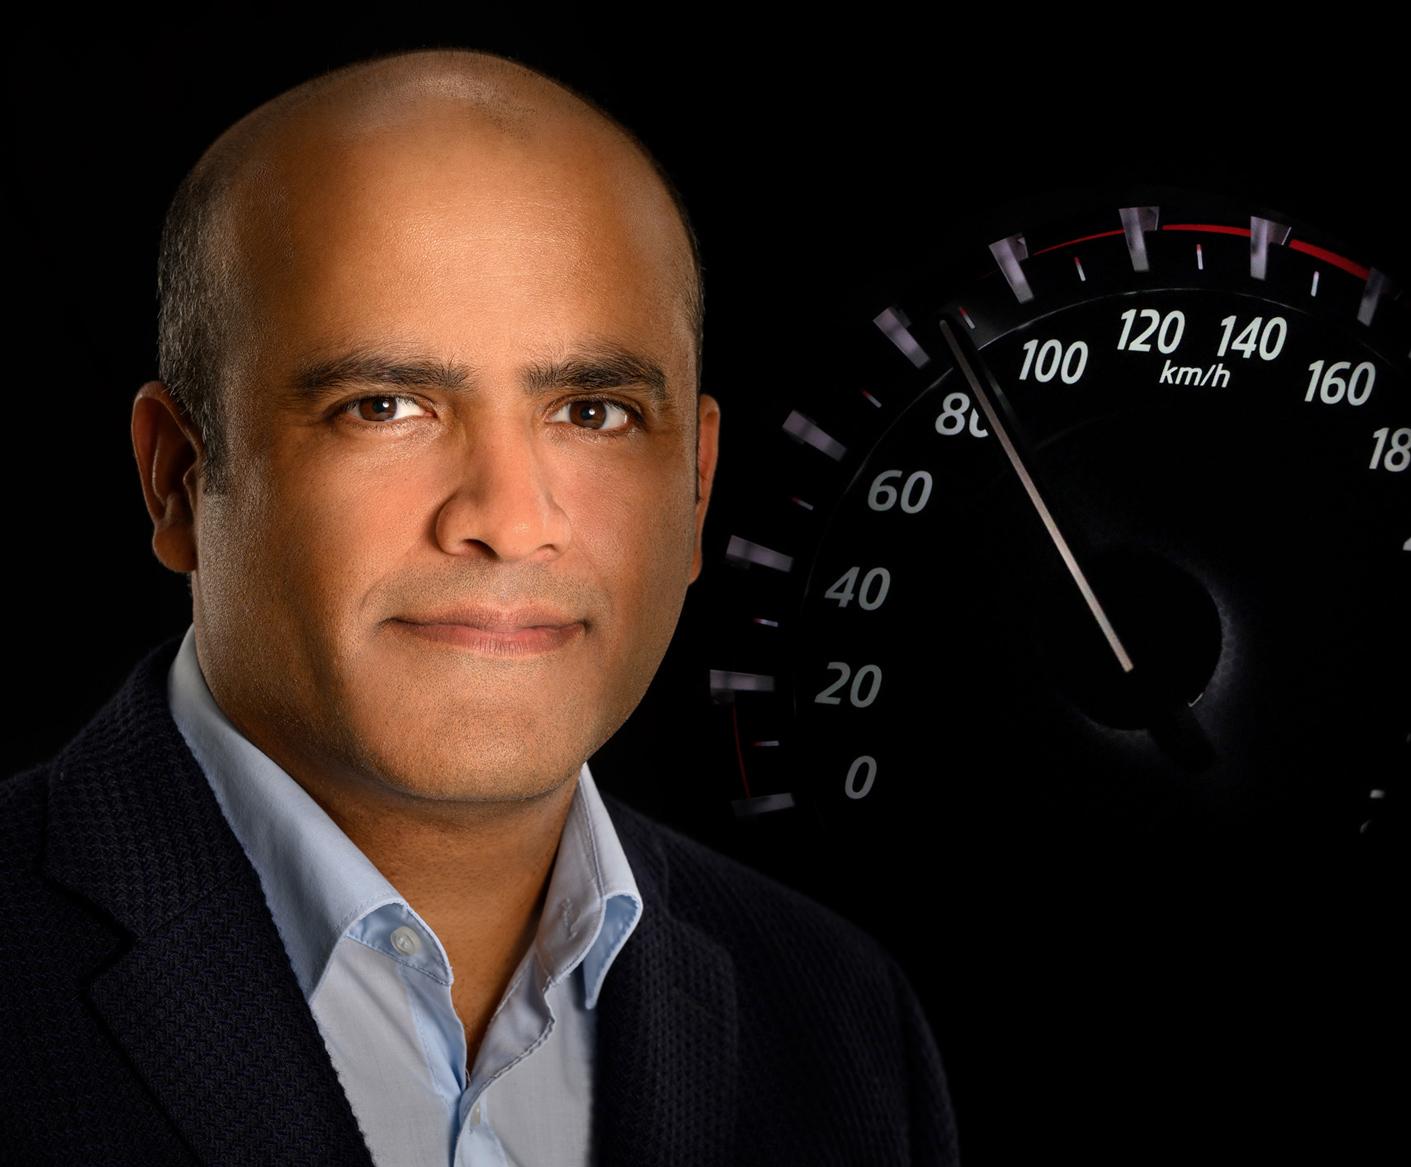 business photography headshot of executive